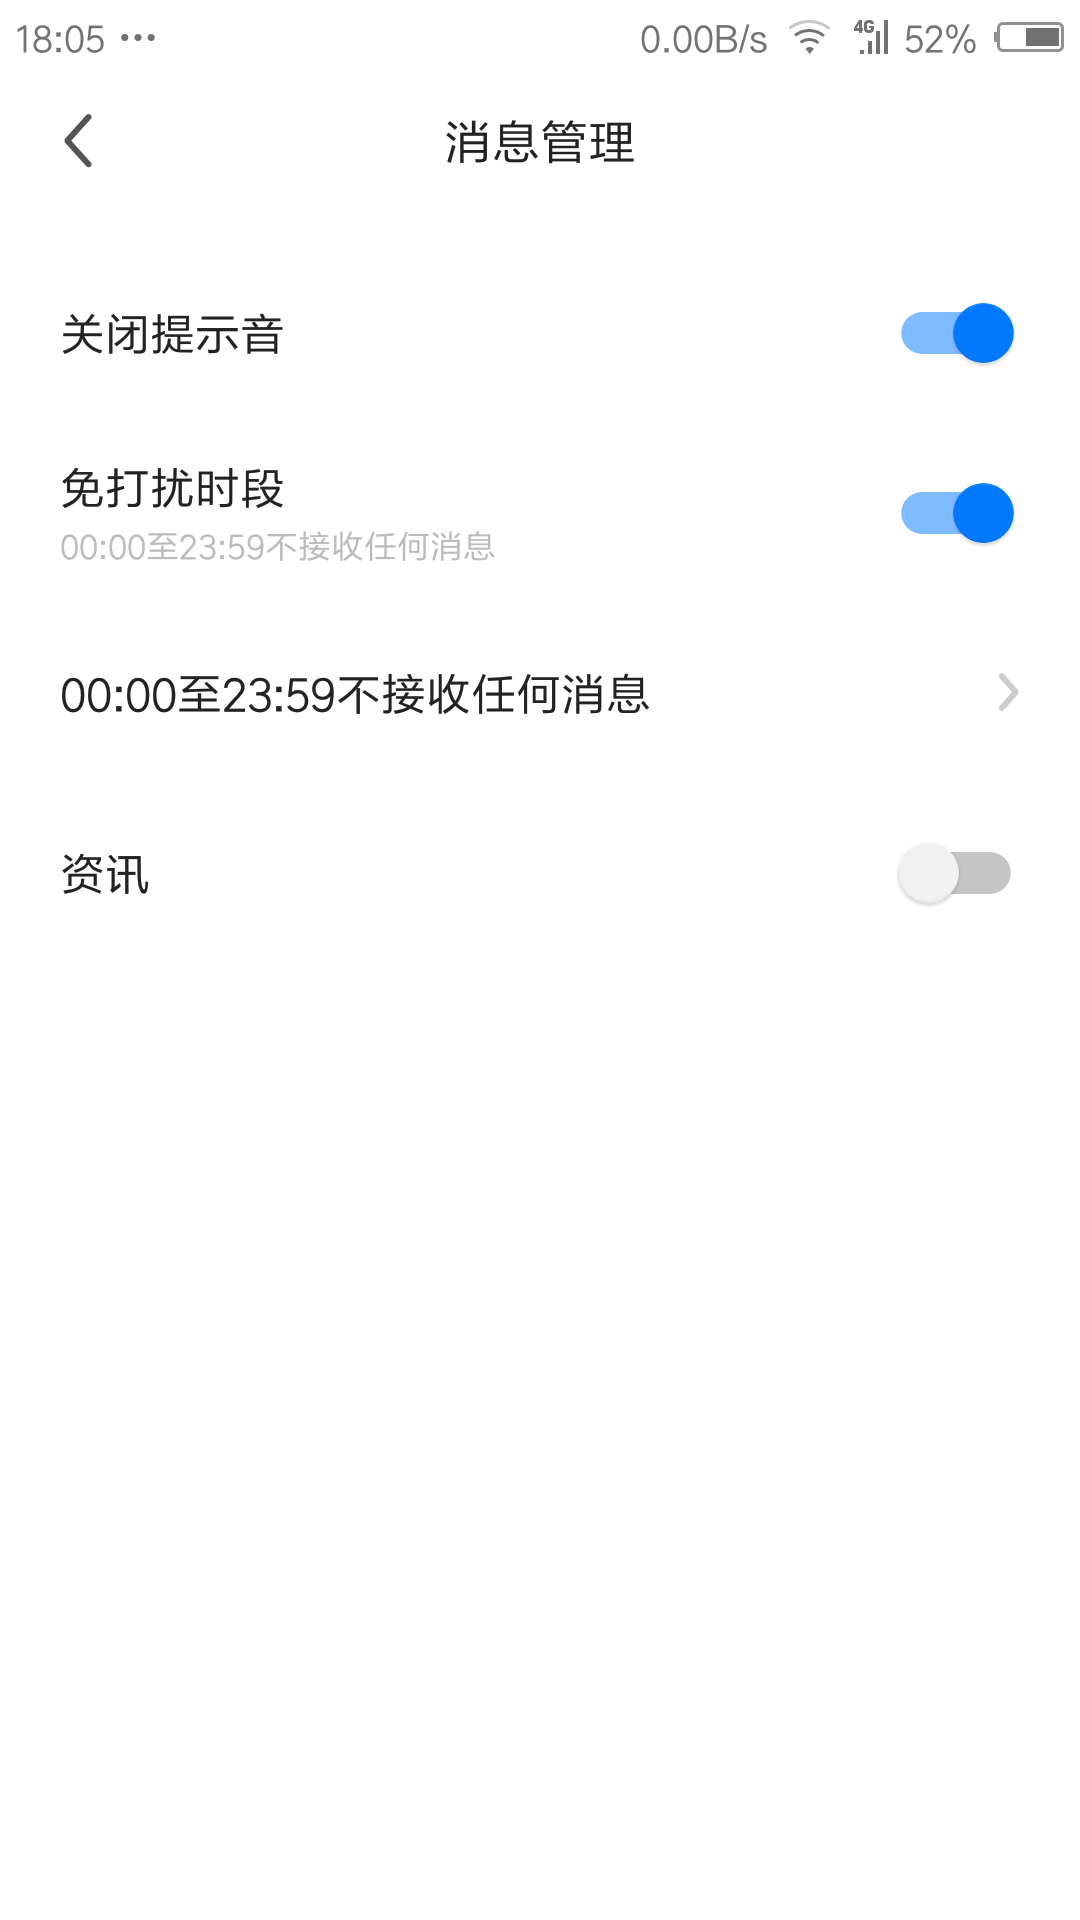 Screenshot_2019-07-15-18-05-17.png